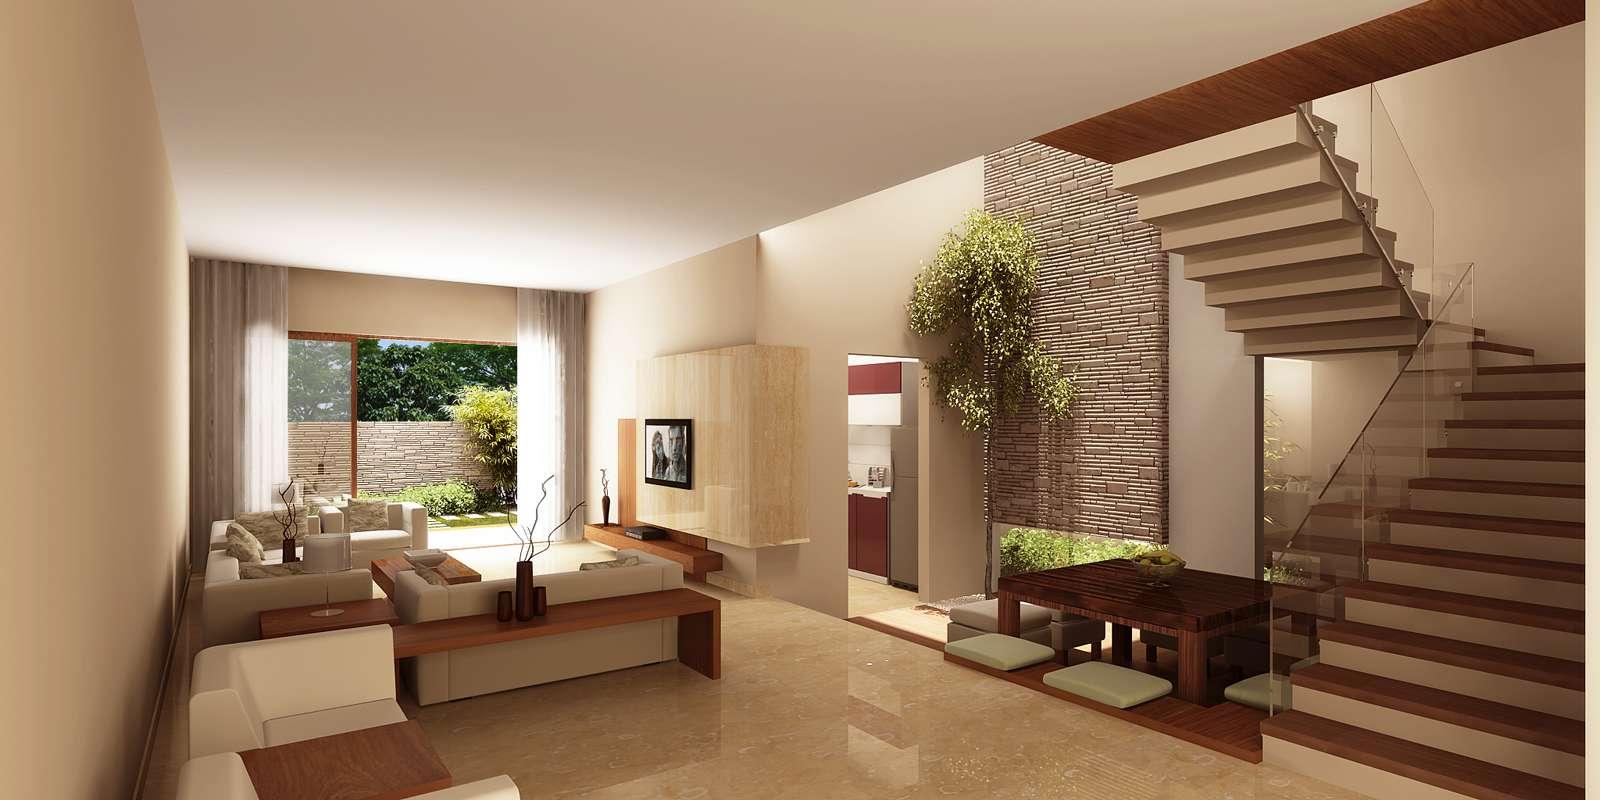 Best Home Interiors Kerala Style Idea House Designs